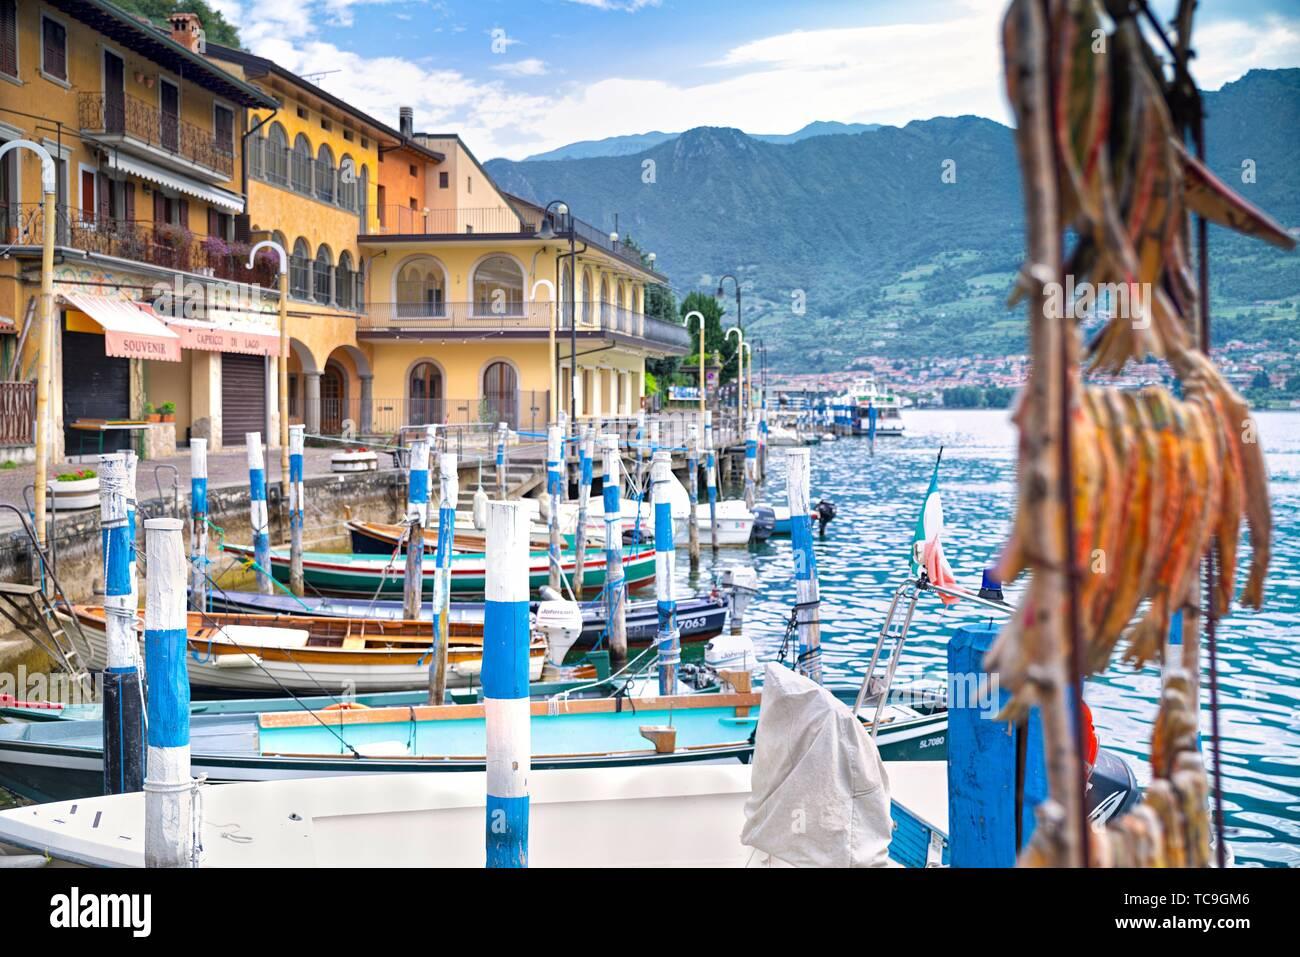 Monte Isola, Sensole village. - Stock Image